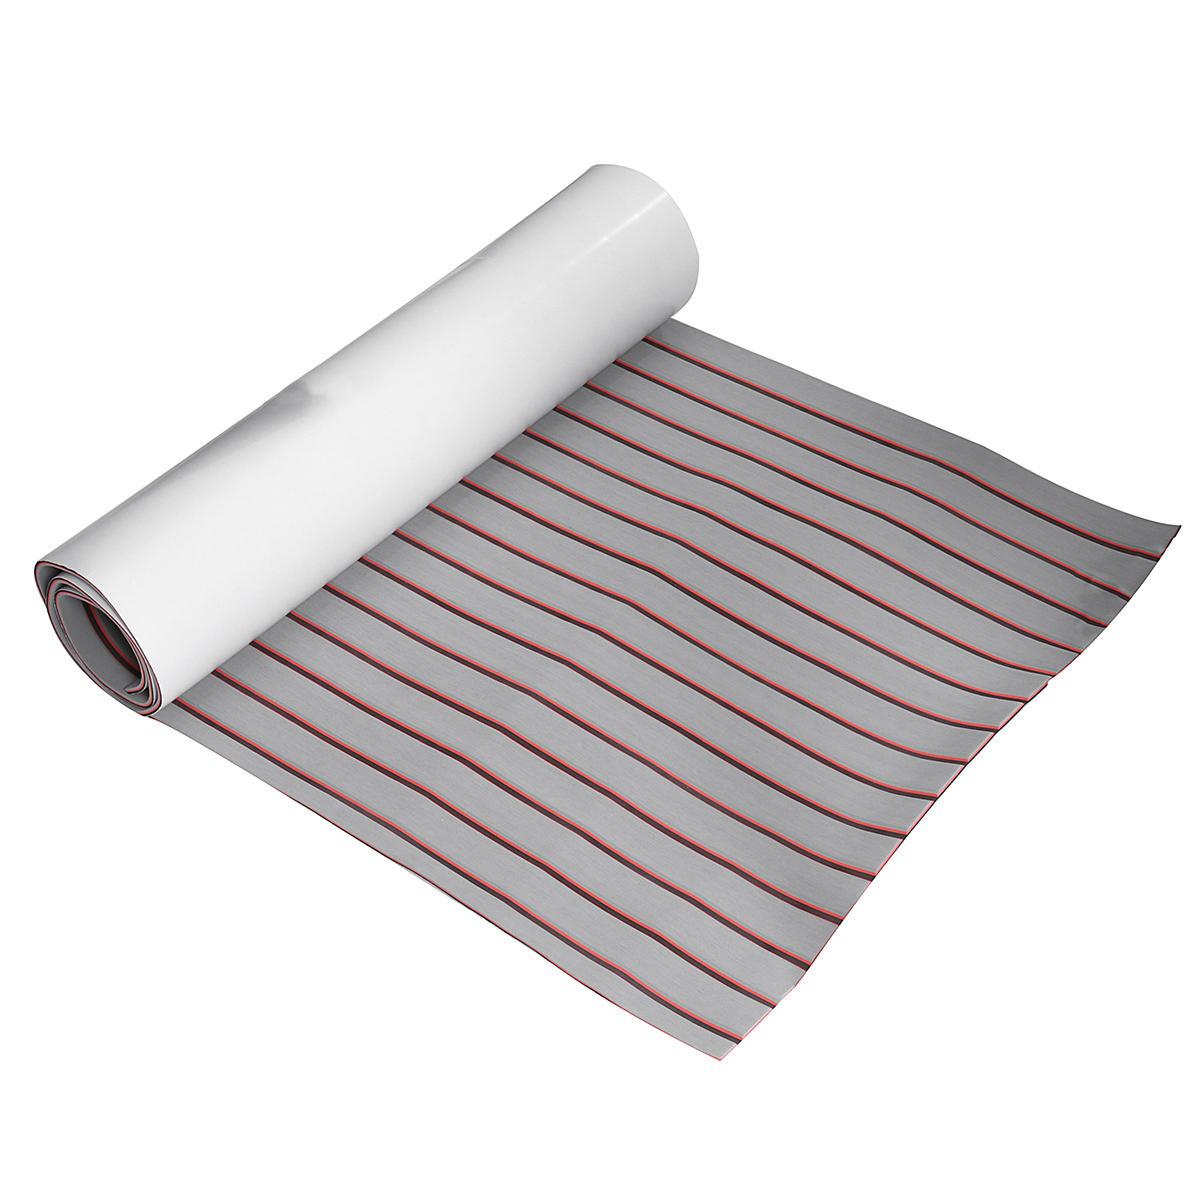 240 x 60cm Boat Flooring Mat Non Slip Carpet EVA Self-Adhesion Foam Camouflage Floor Cover for Marine Boat